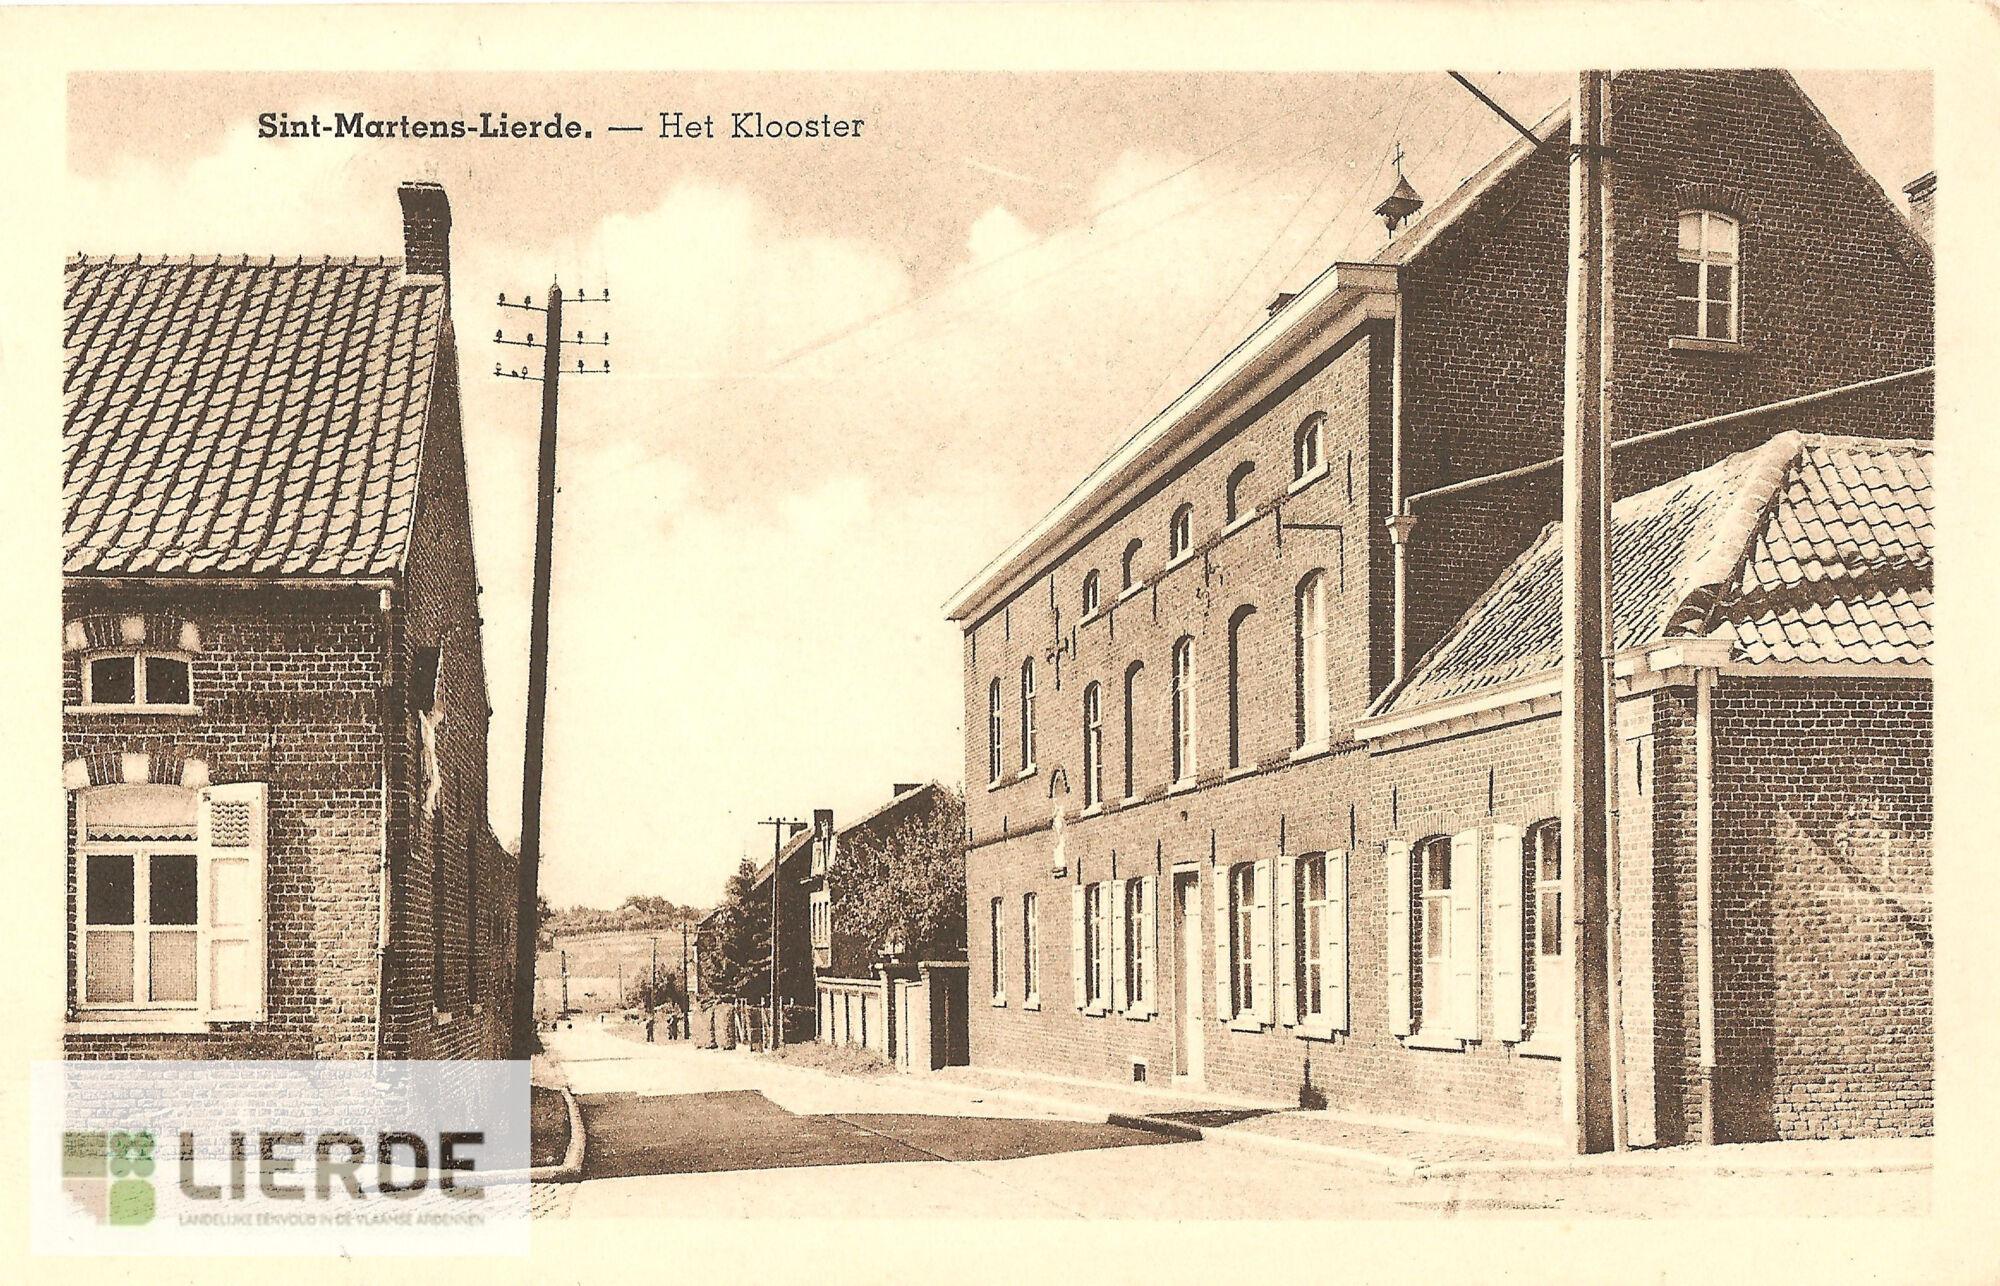 Klooster Sint-Martens-Lierde